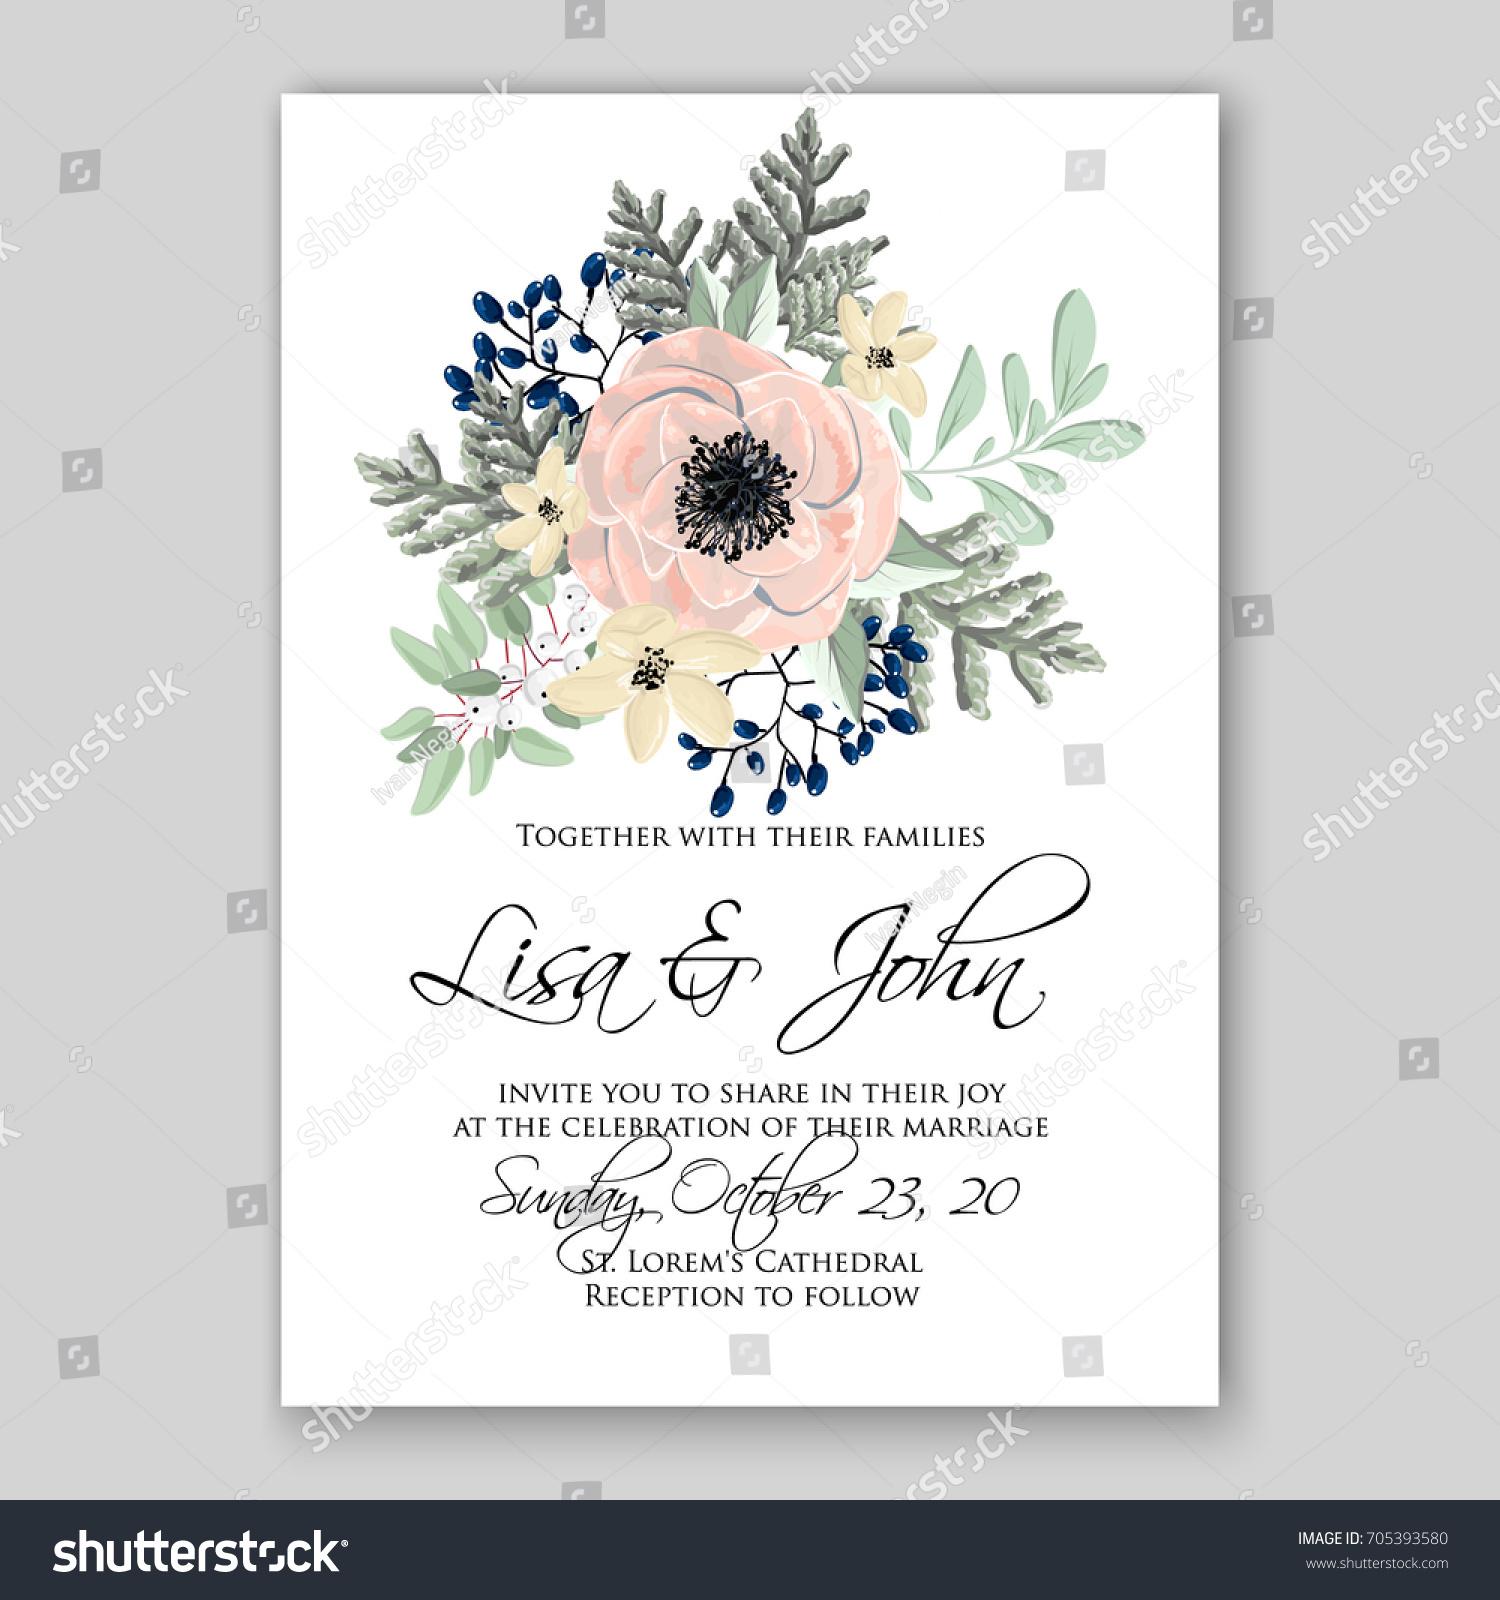 Wedding Card Invitation Template Poppy Anemone Stock Vector ...